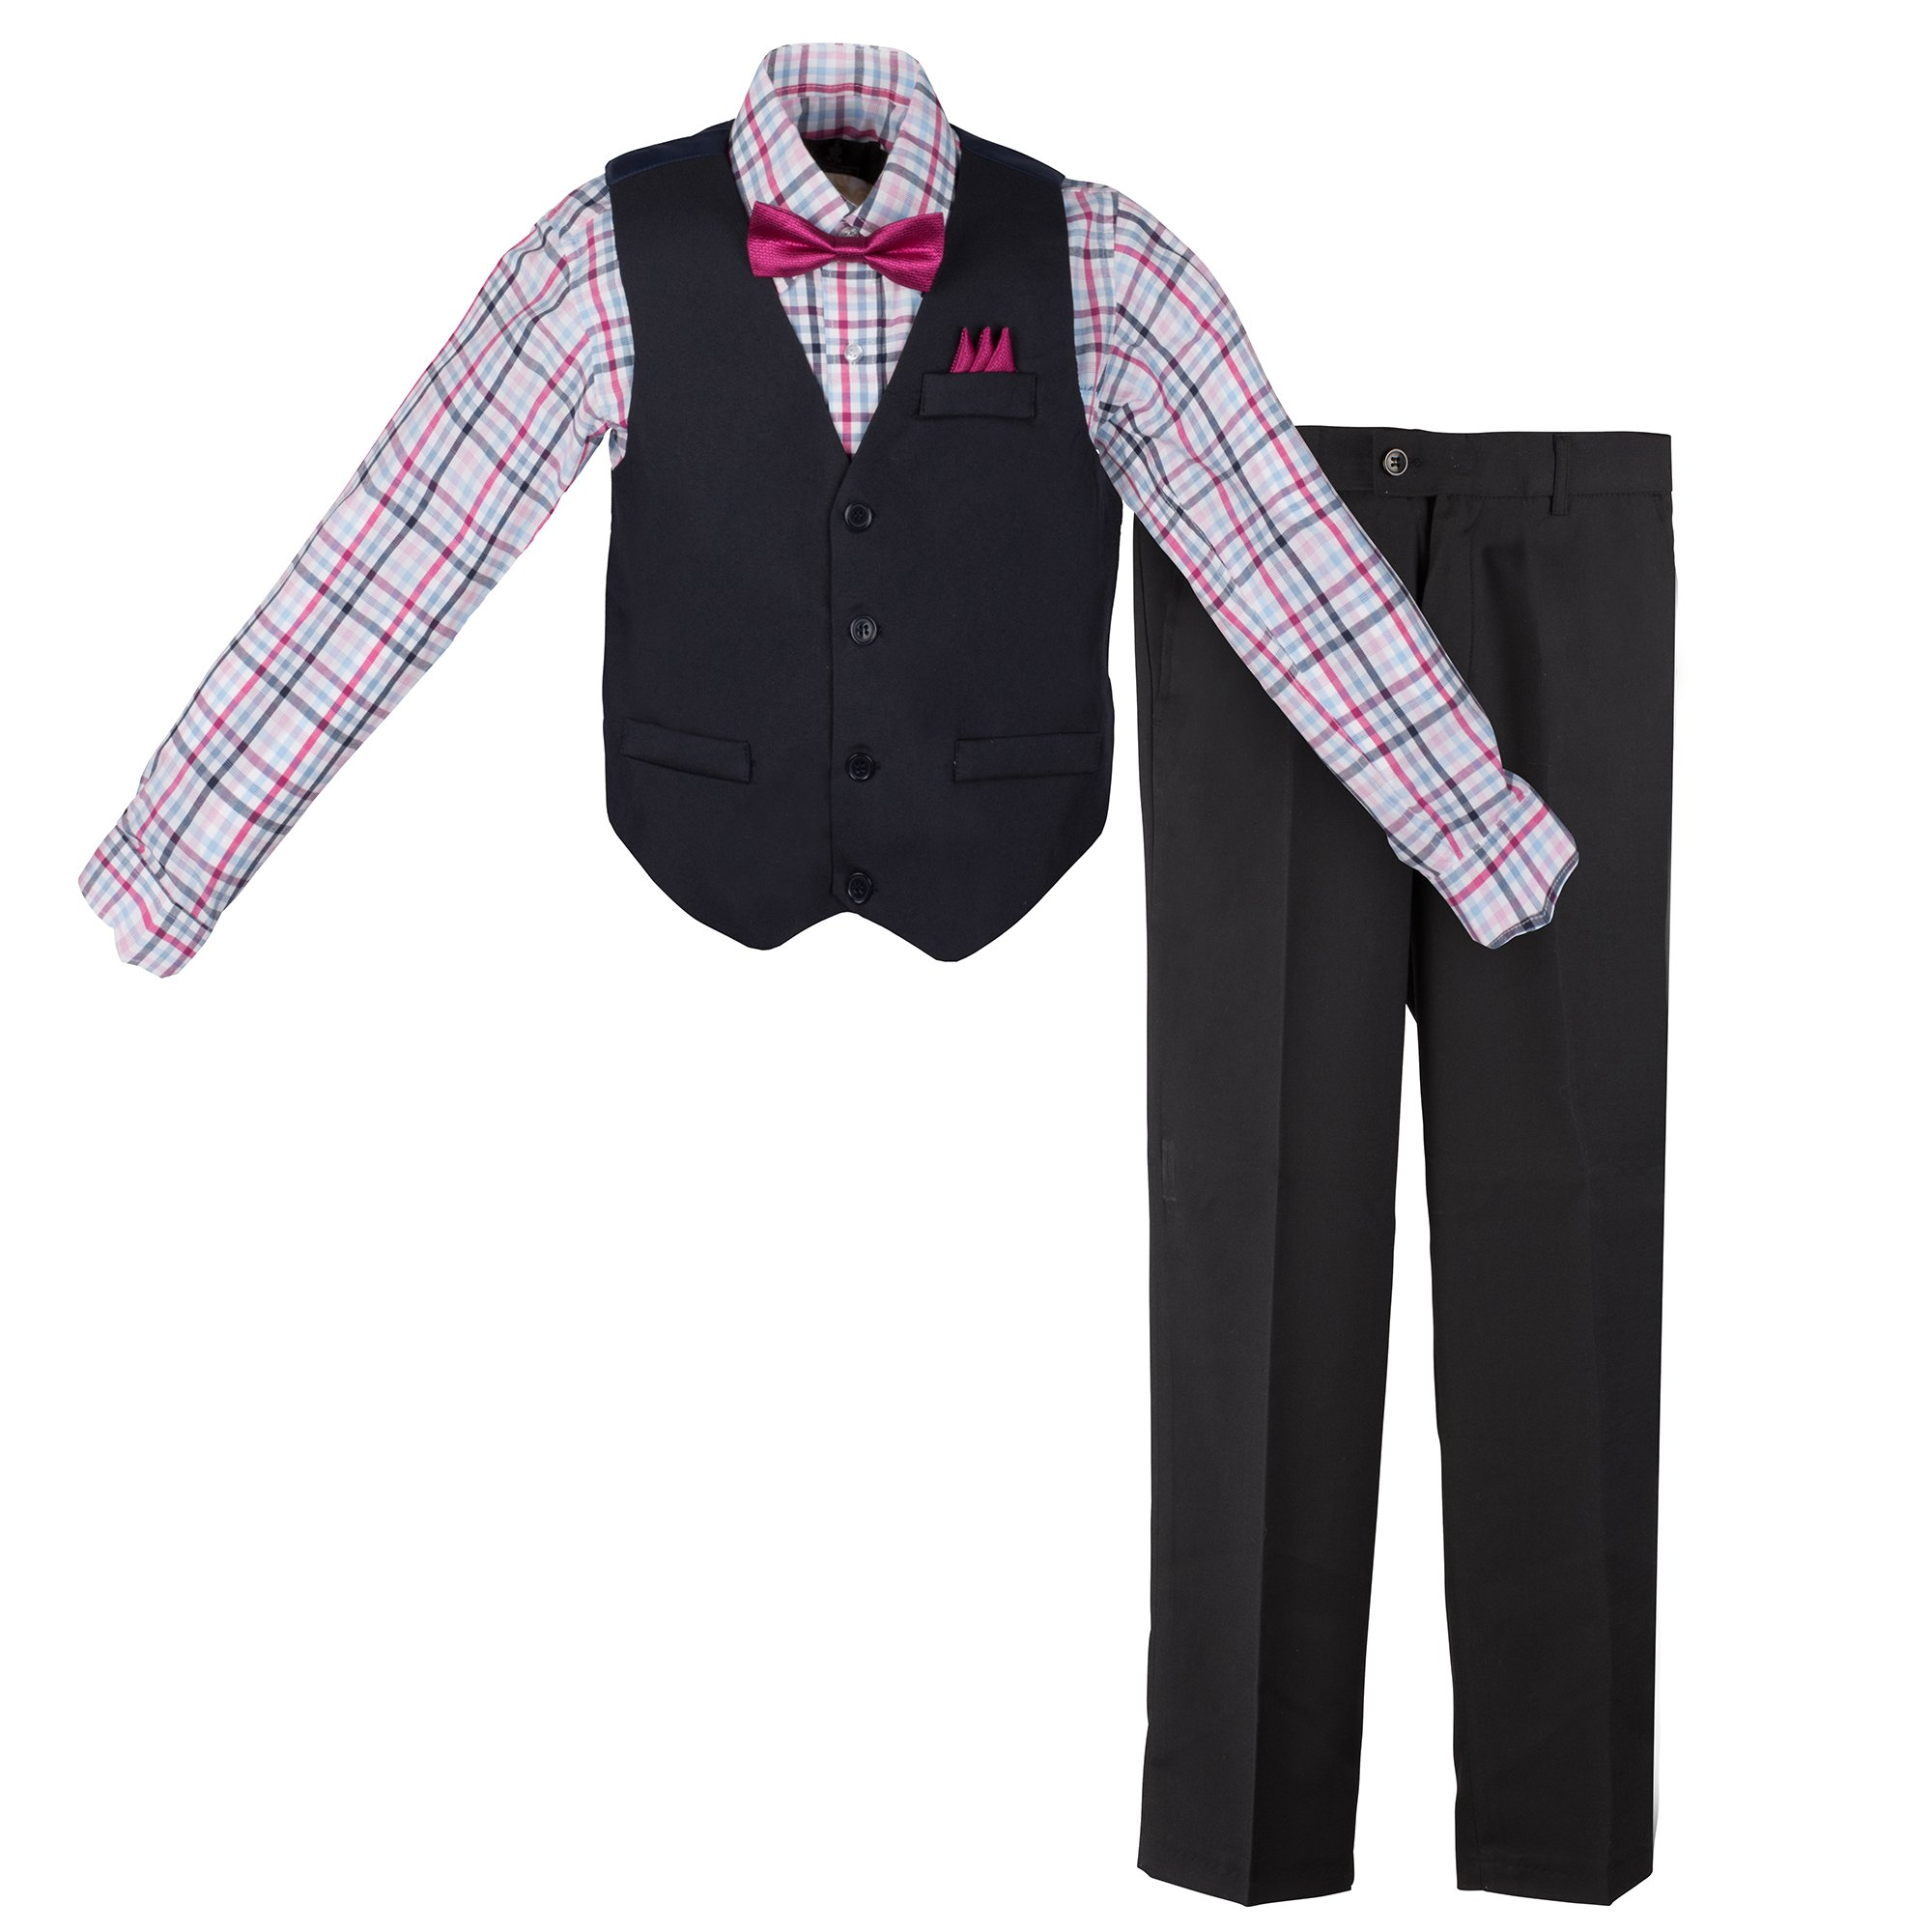 Vittorino Boys 4 Piece Suit Set with Vest Shirt Tie Pants and Hankerchief,Navy - Fuchsia,5